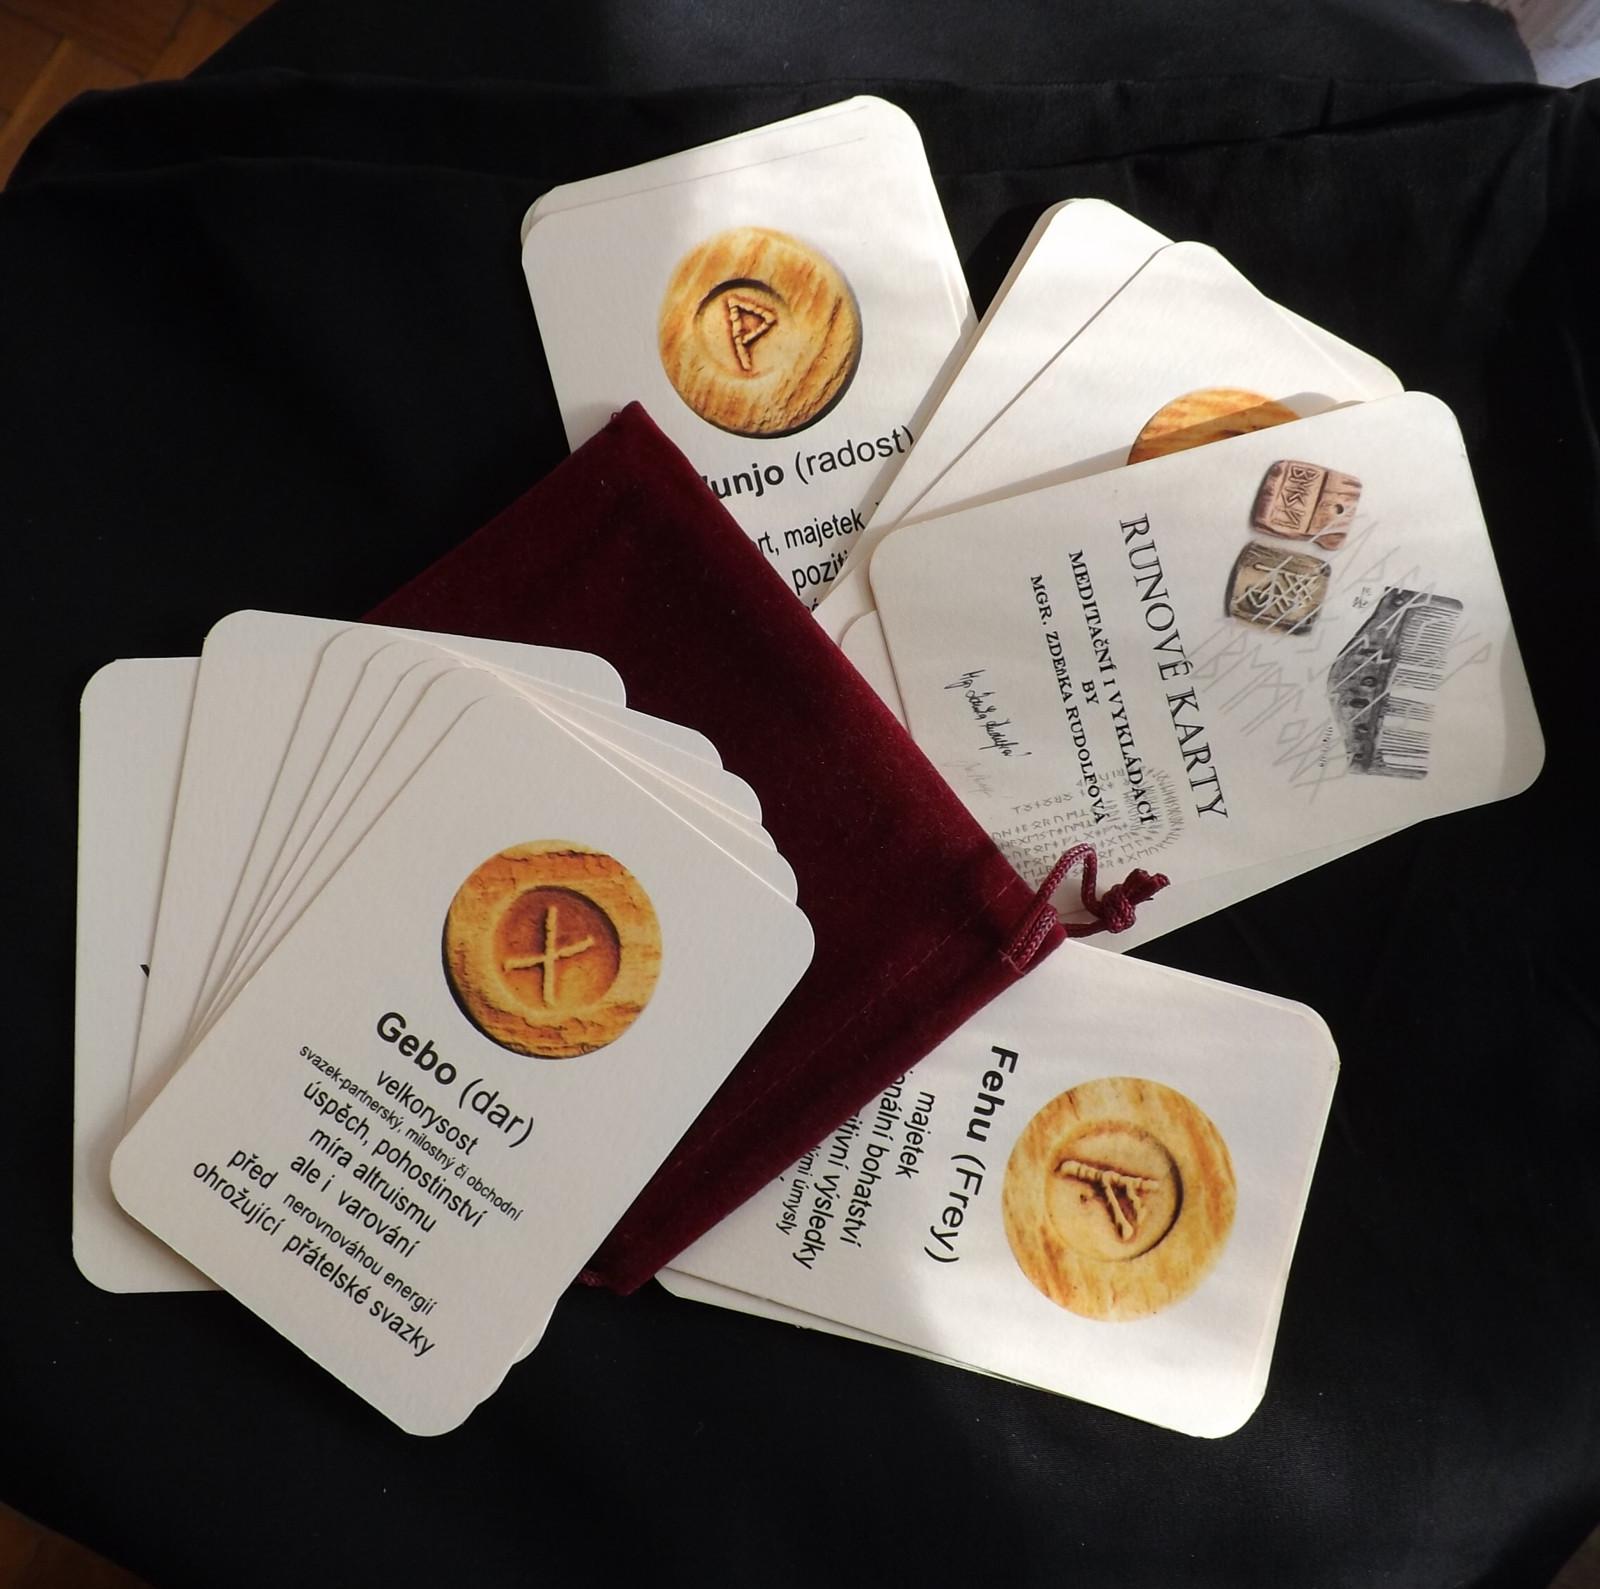 Runove Karty Autorske Meditacni I Vykladaci Zbozi Prodejce Ruz